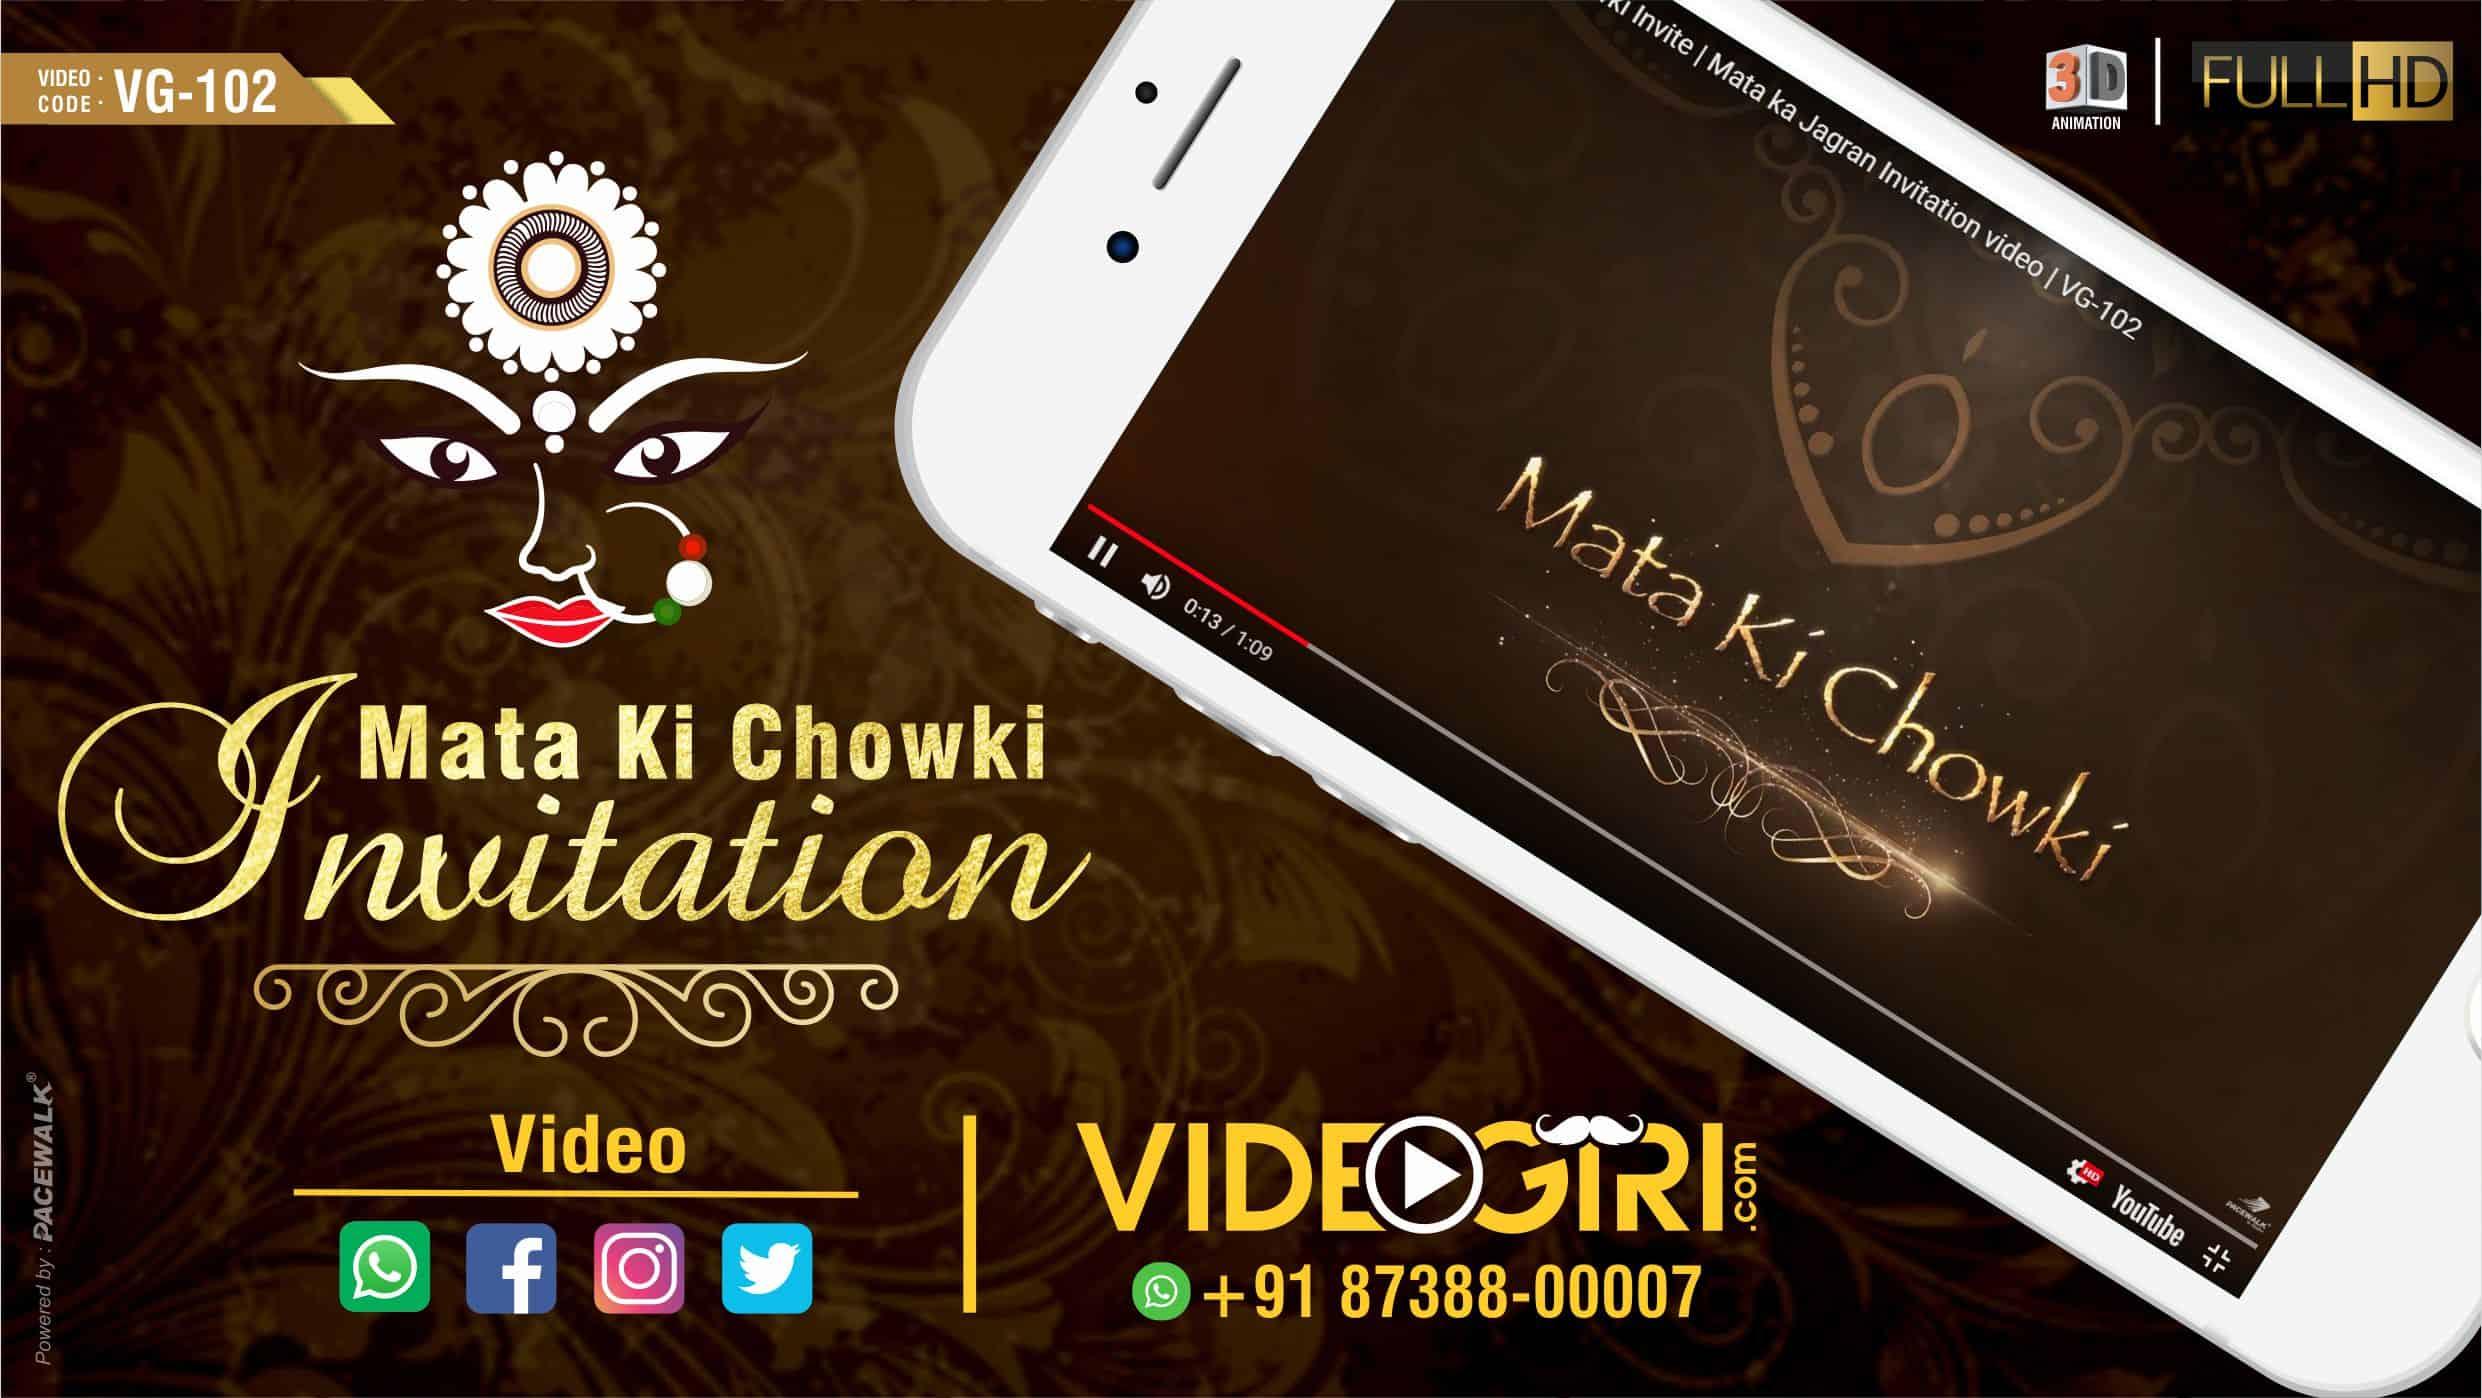 Mata ki chowki invite video for mobile mata ka jagran invitation video stopboris Choice Image